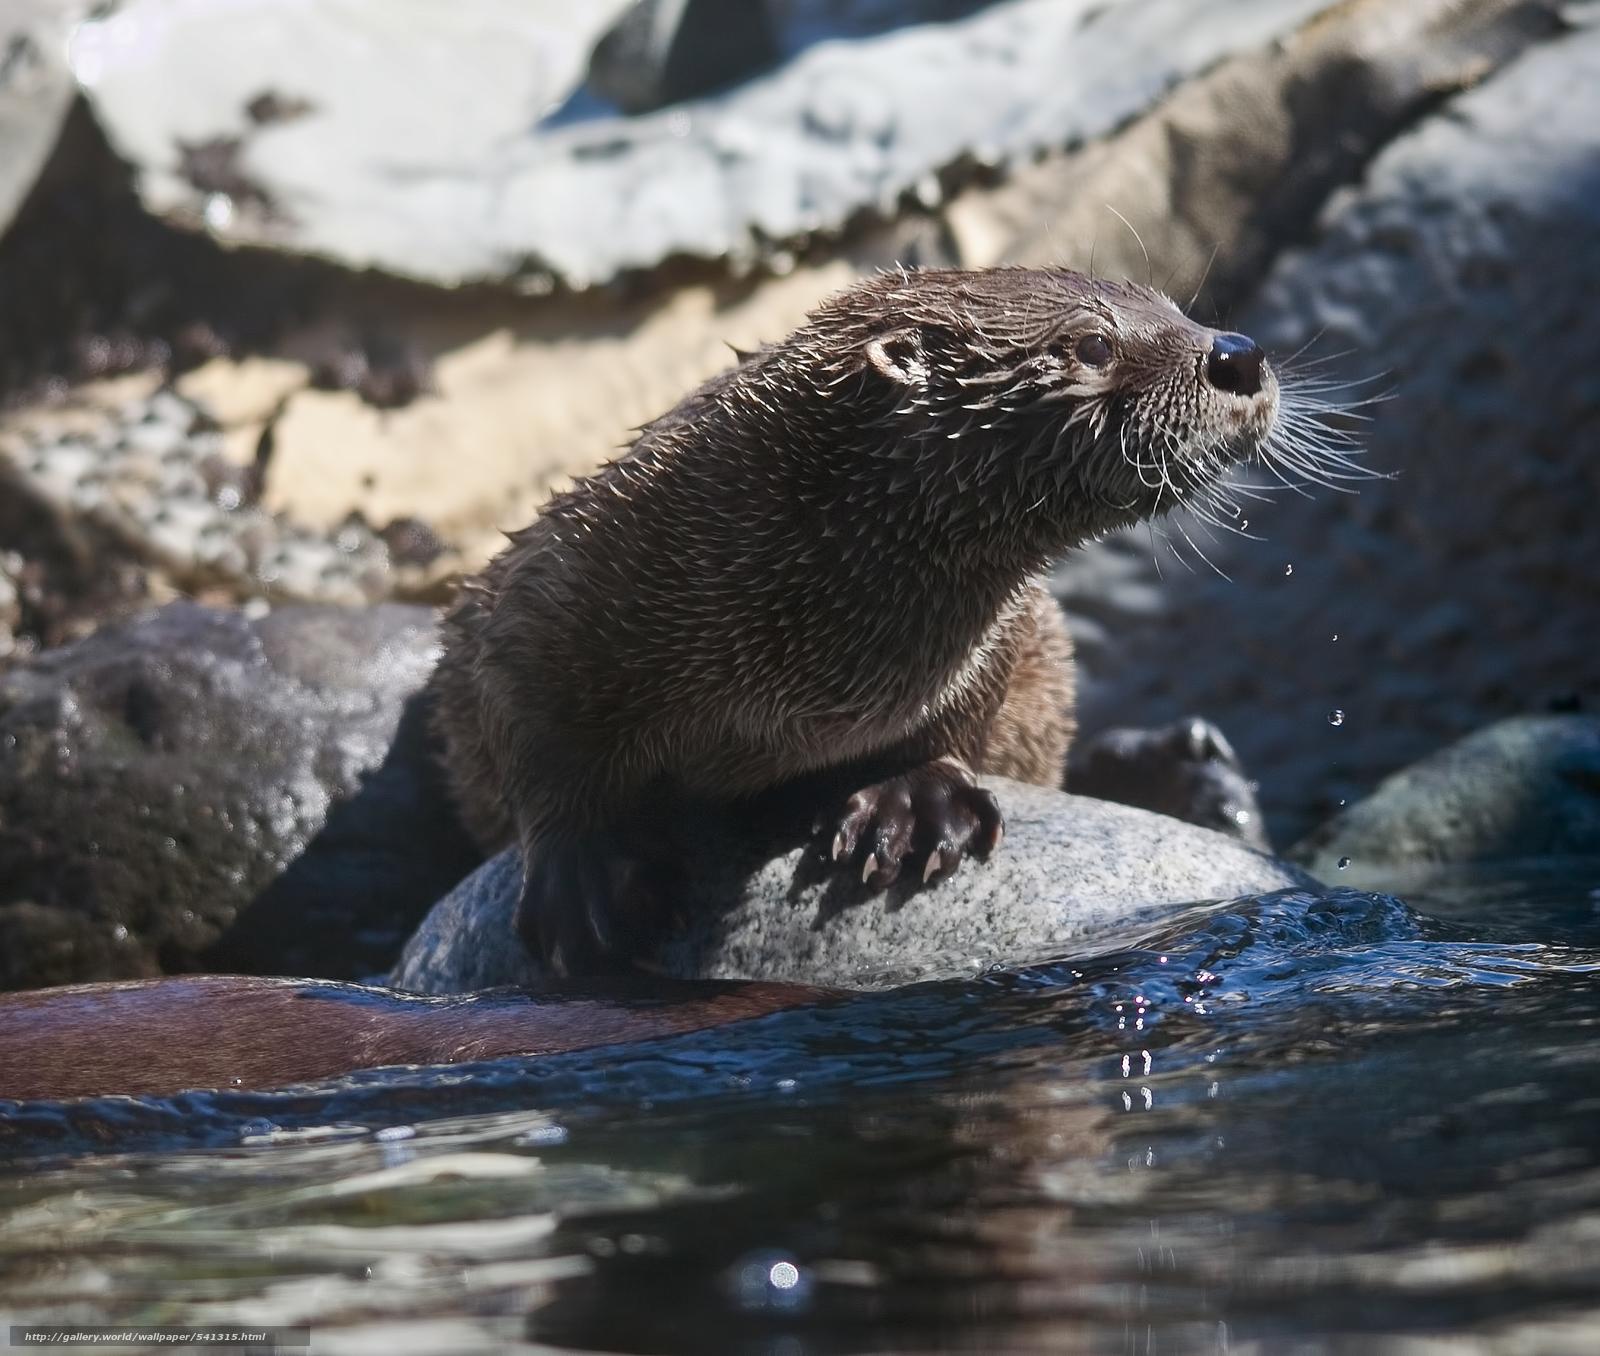 Download wallpaper river otter river Otter desktop wallpaper 1600x1356